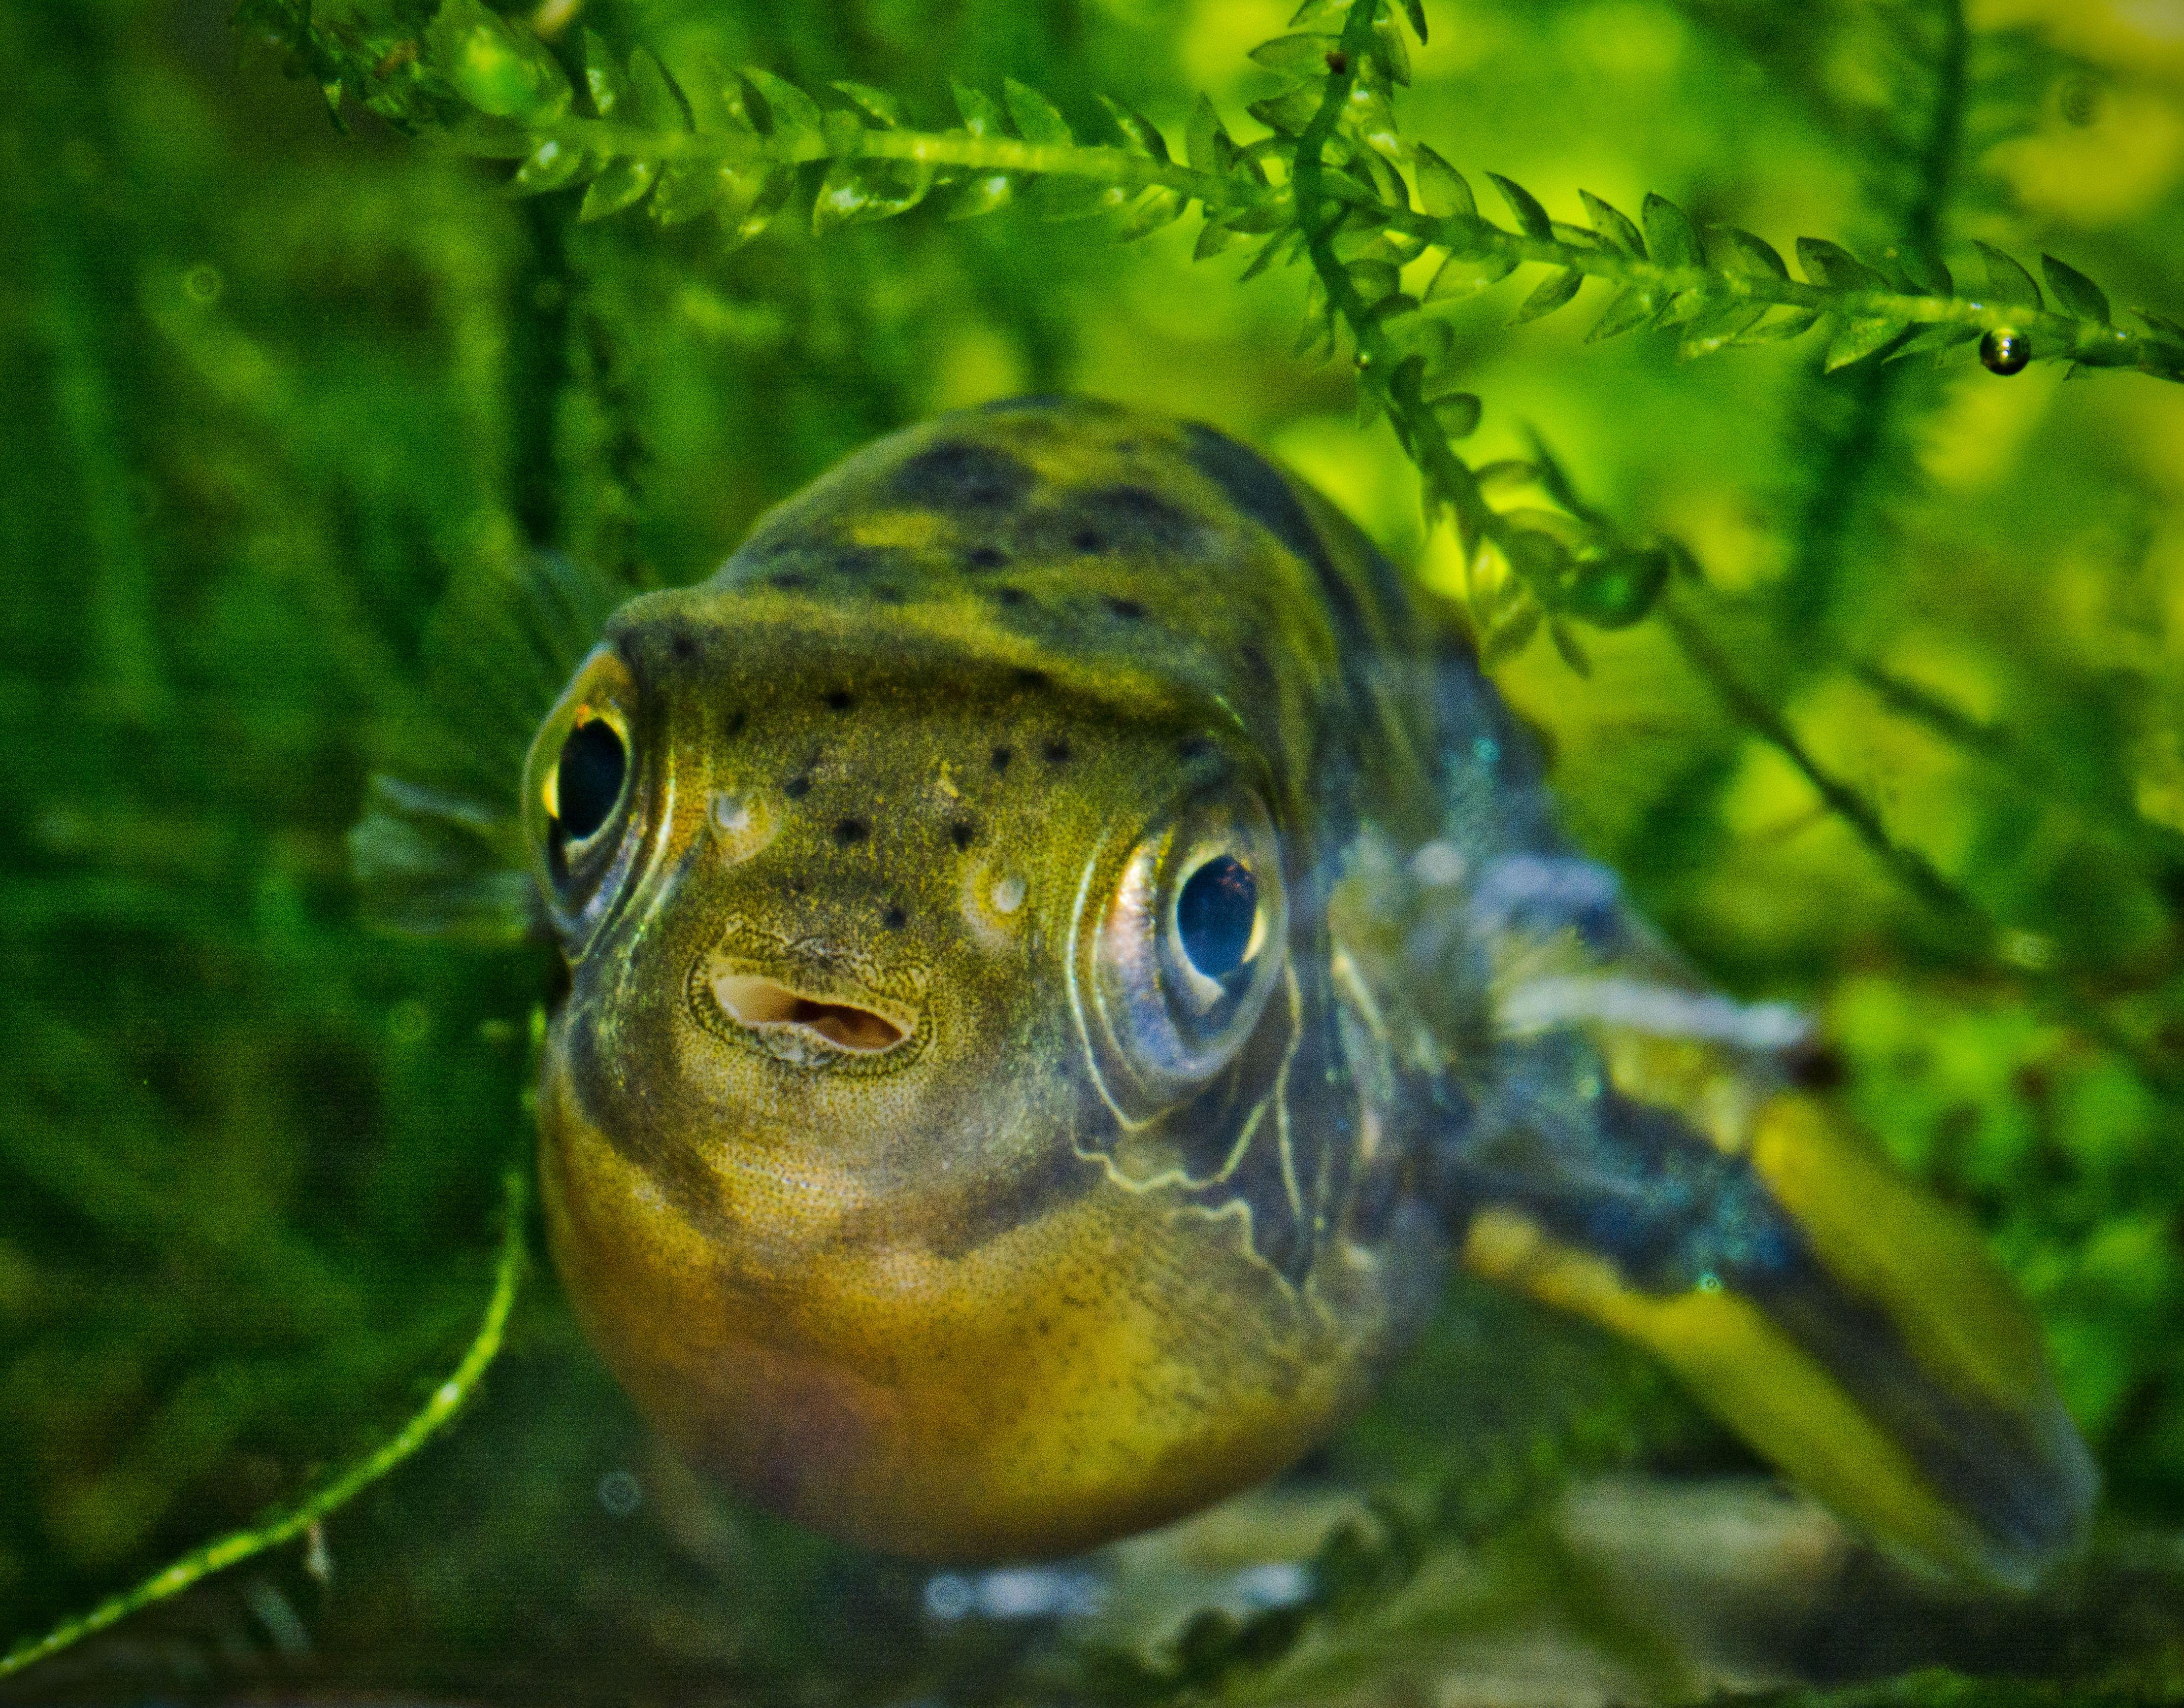 Dwarf Puffer Carinotetraodon Travancoricus Dwarf Puffer Fish Puffer Fish Fish